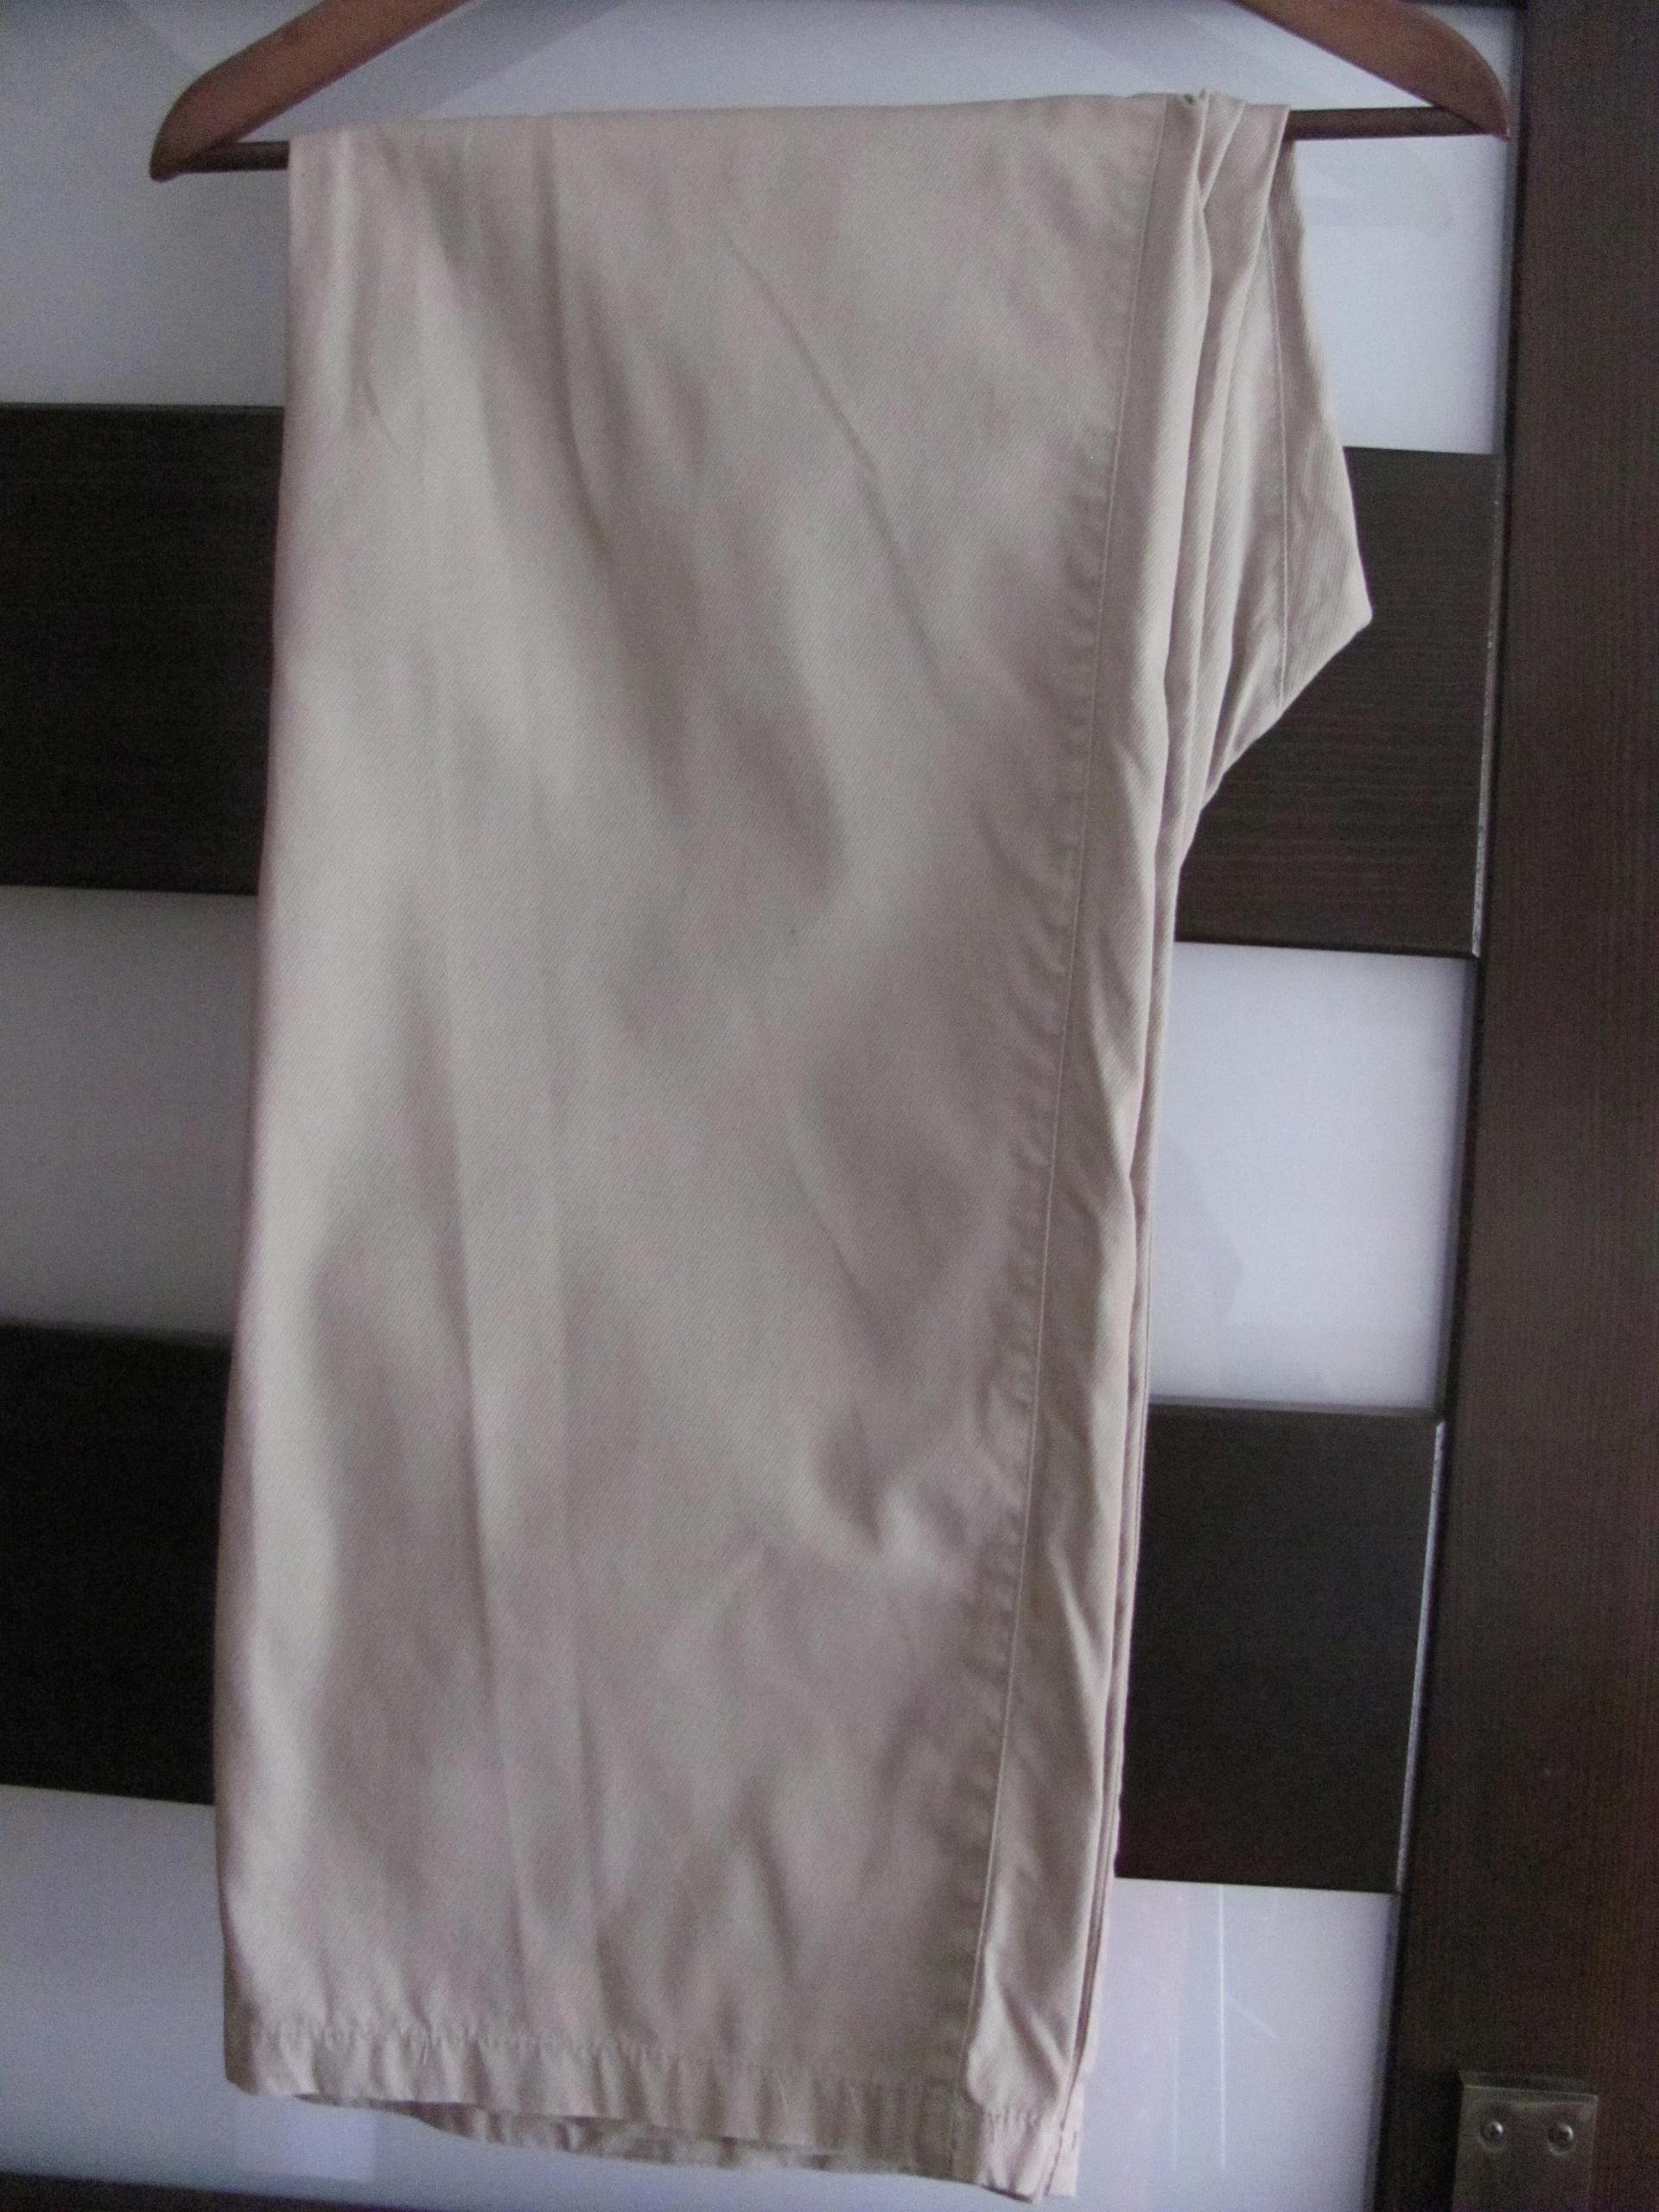 Spodnie długie męskie, Reserved